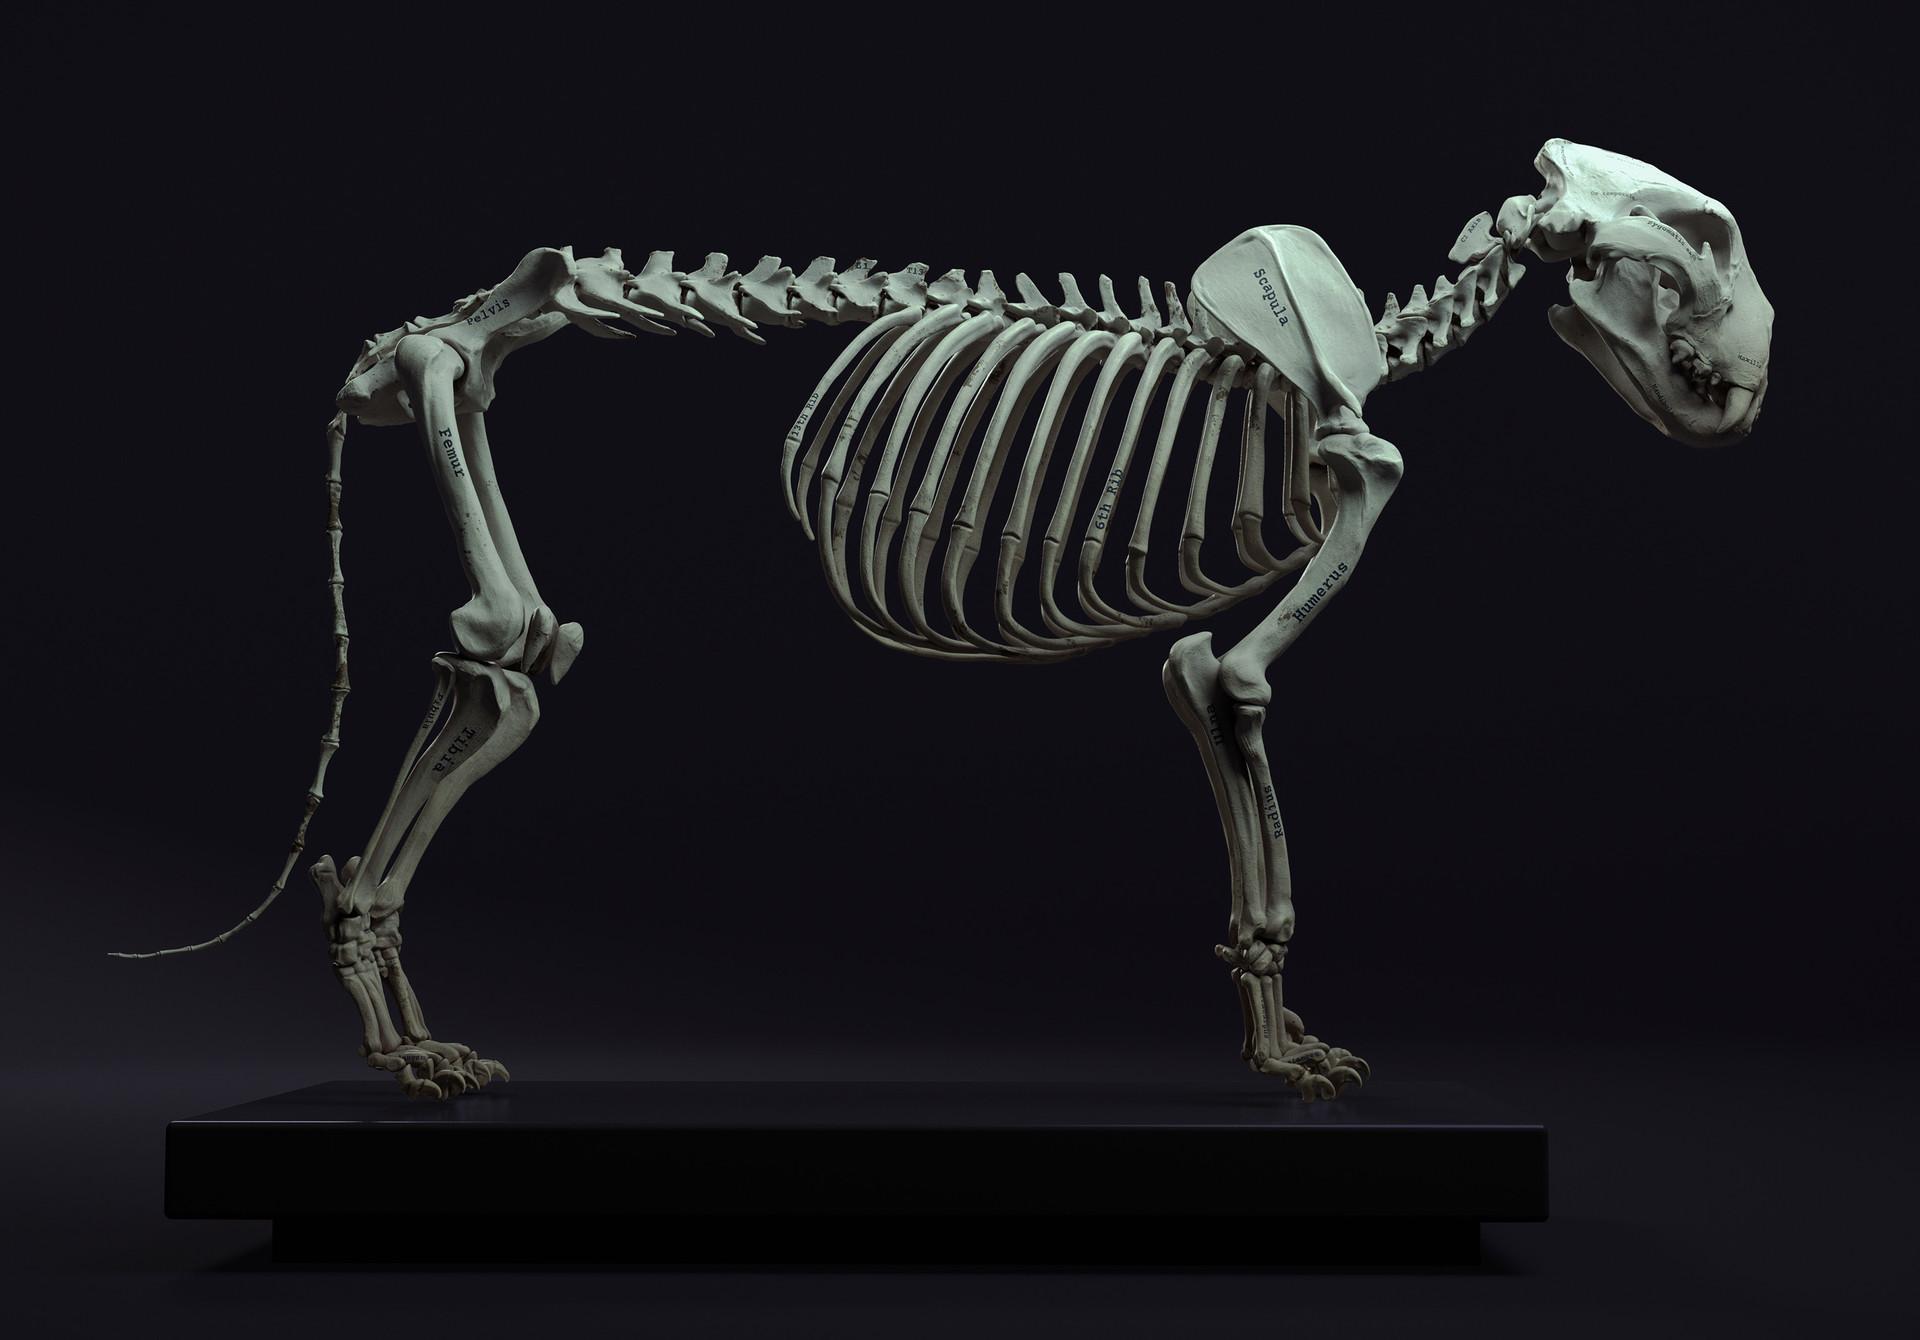 Lion Skeleton Anatomy - Best Image and Description About Lion